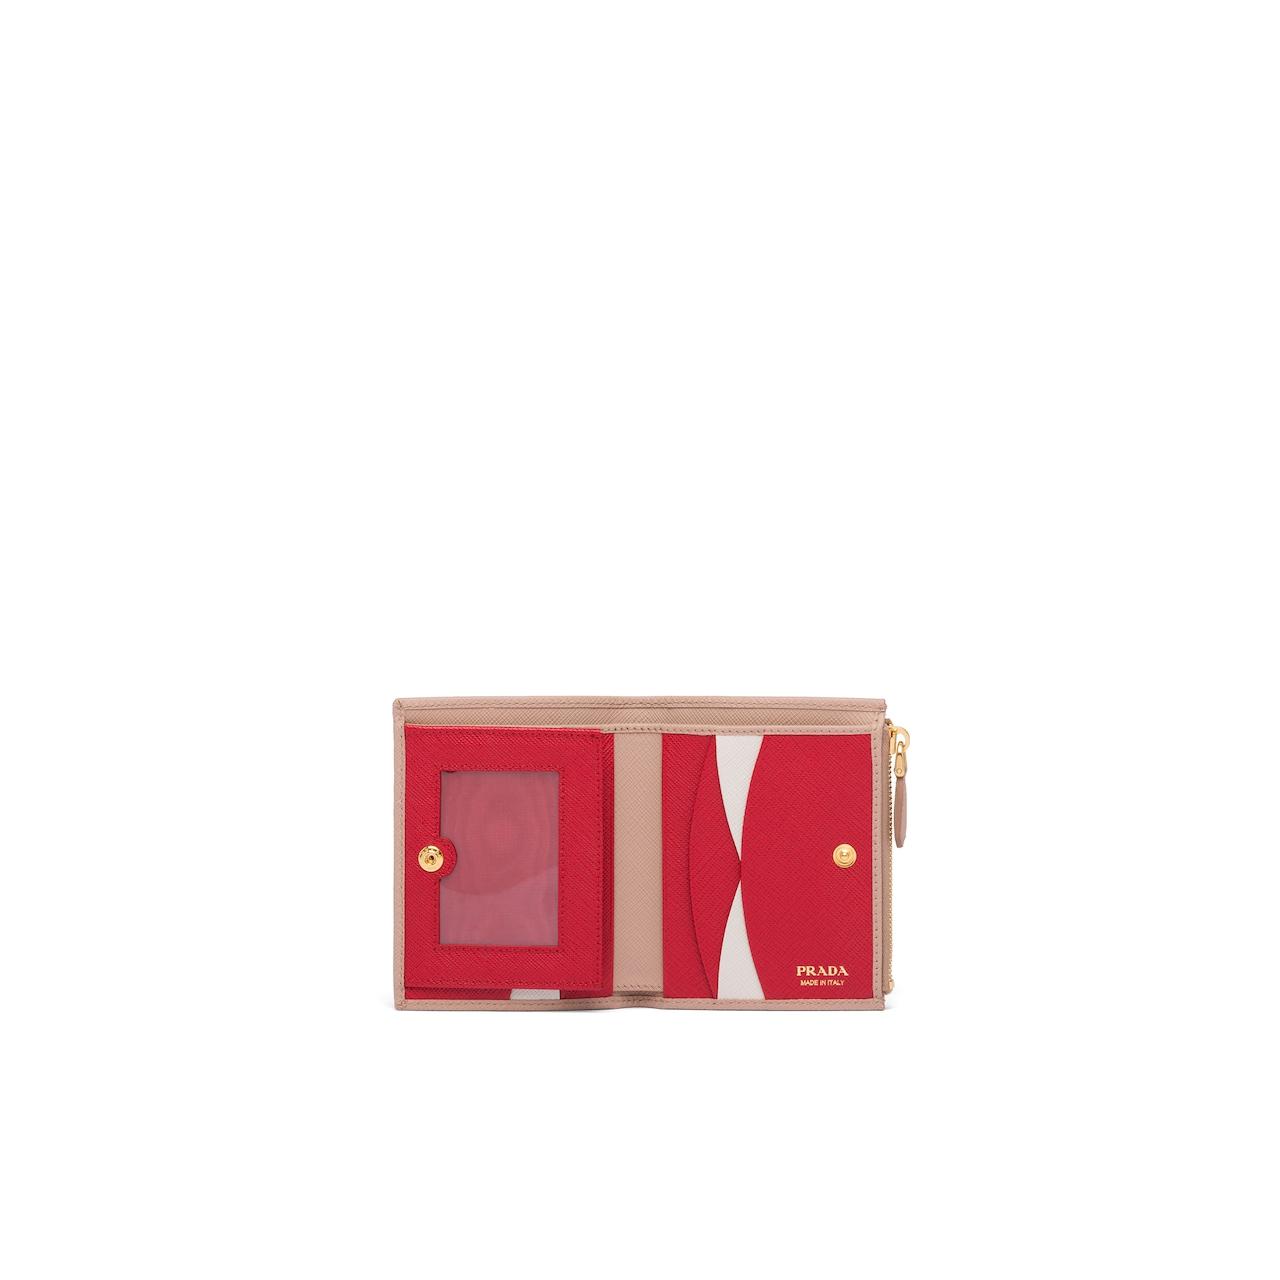 Prada Saffiano 皮革小号钱夹 2